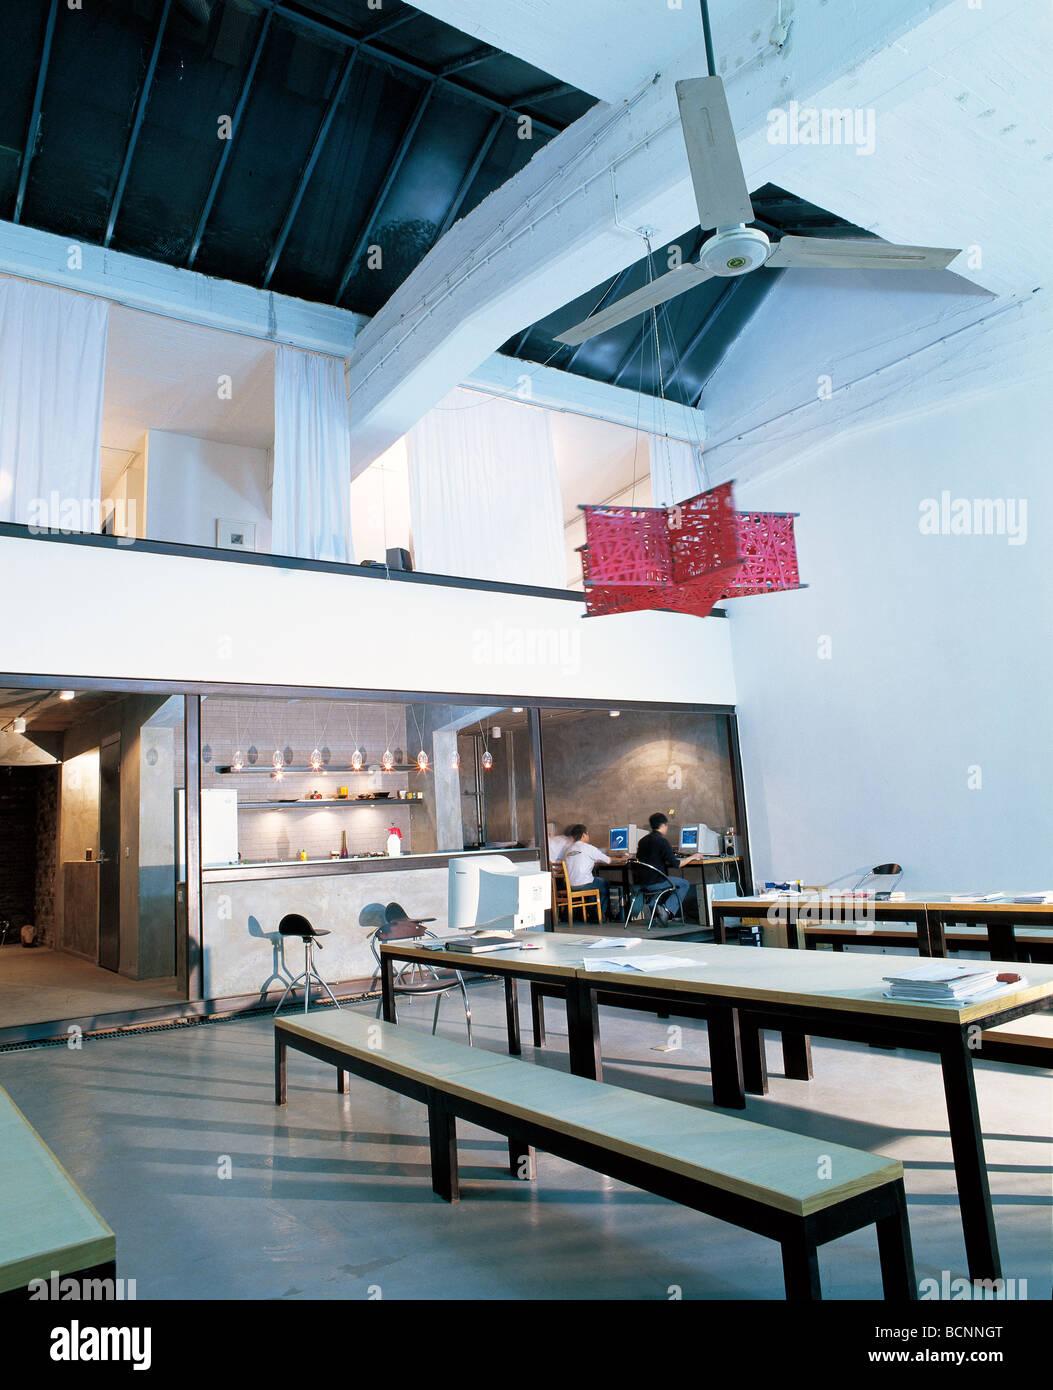 Liao Ge Zi Restaurant owned by comtemporary artist Mr. Lizi Mao, 798 Art District, Beijing, China Stock Photo